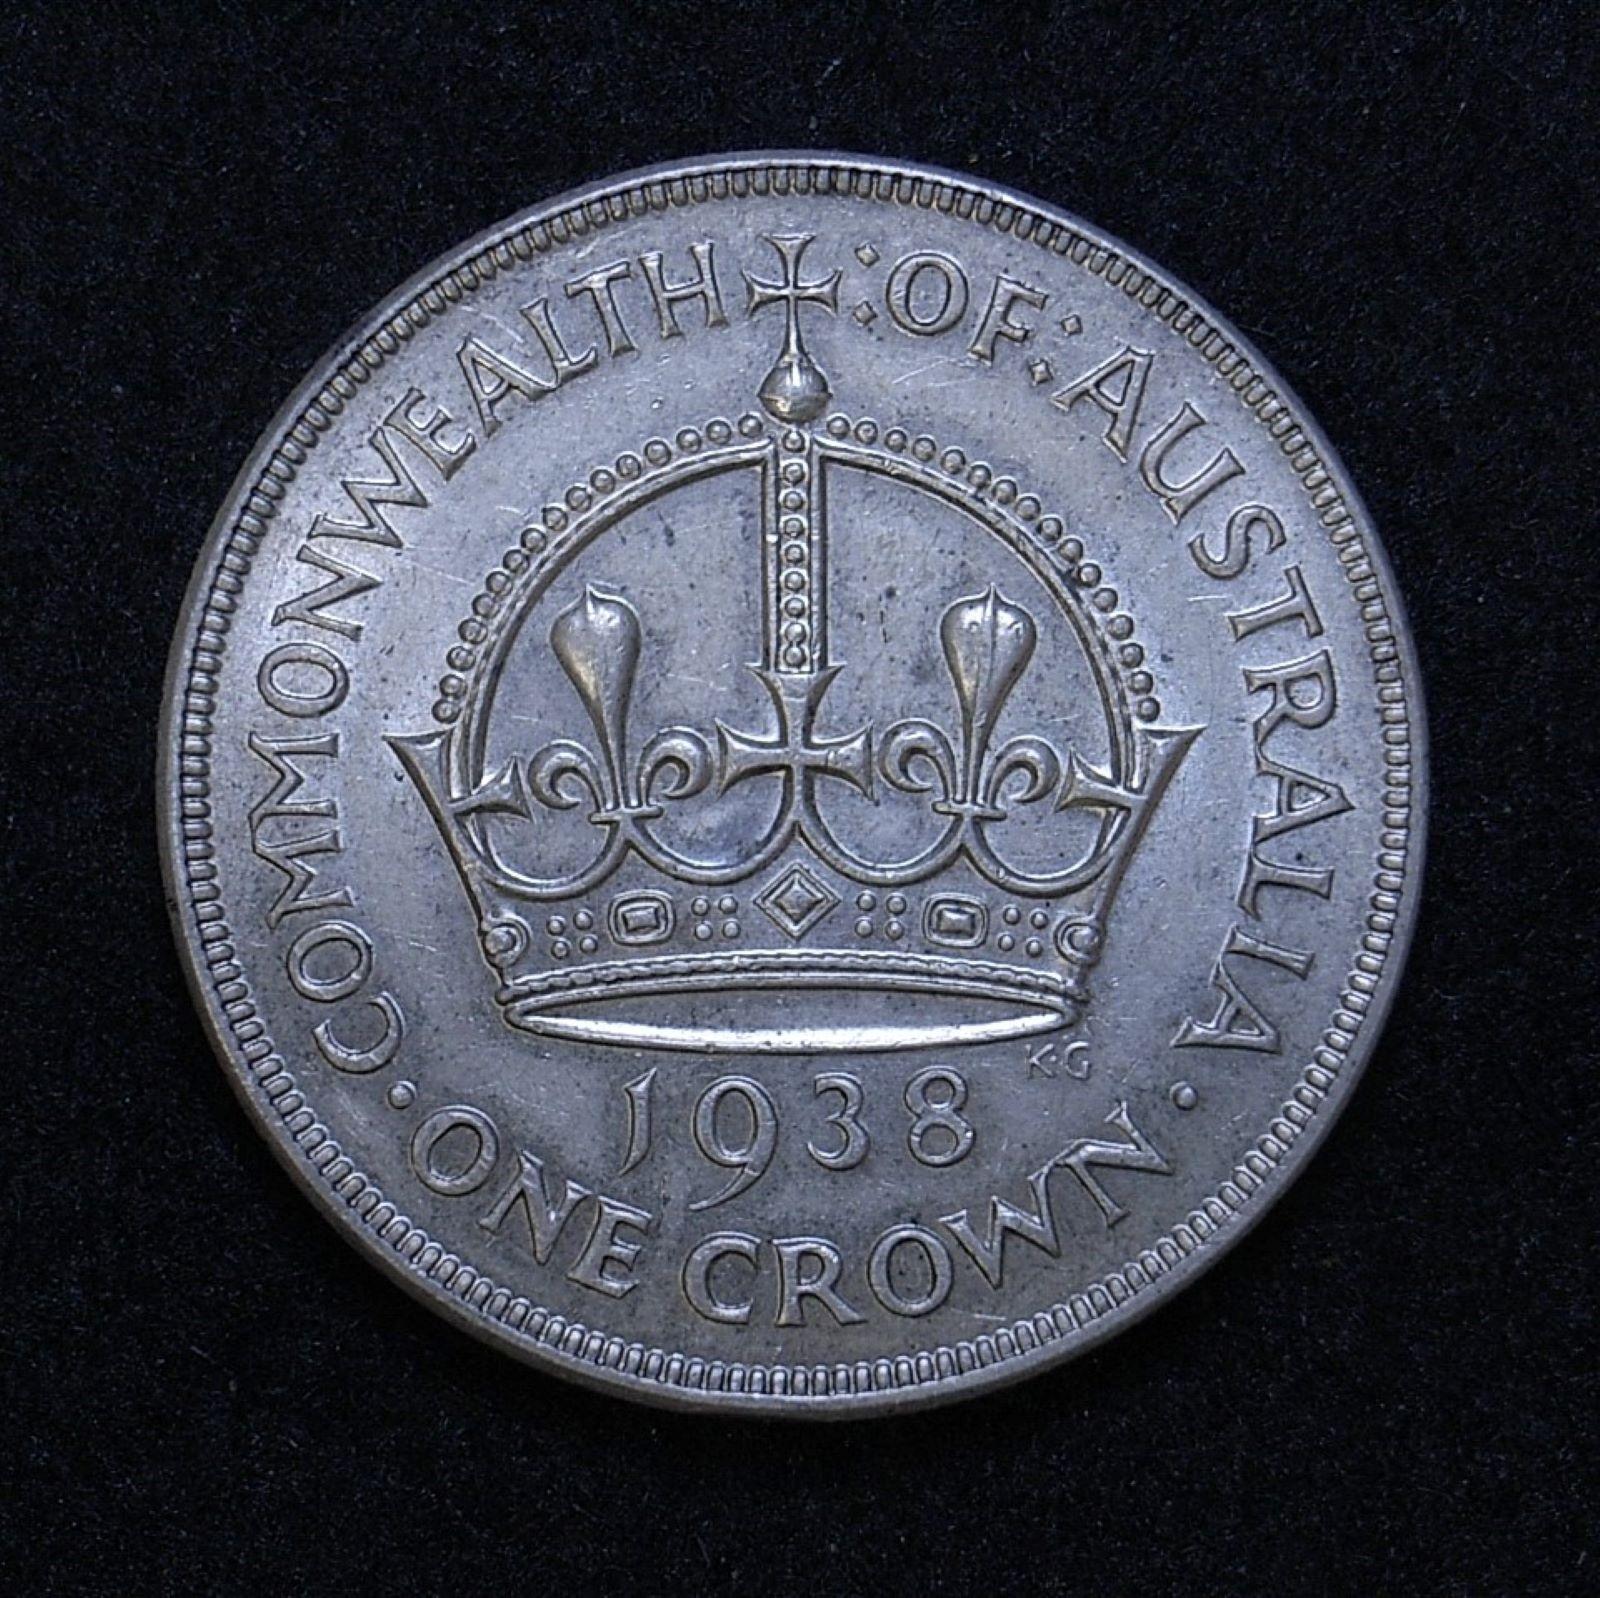 Aus Crown 1938 rev